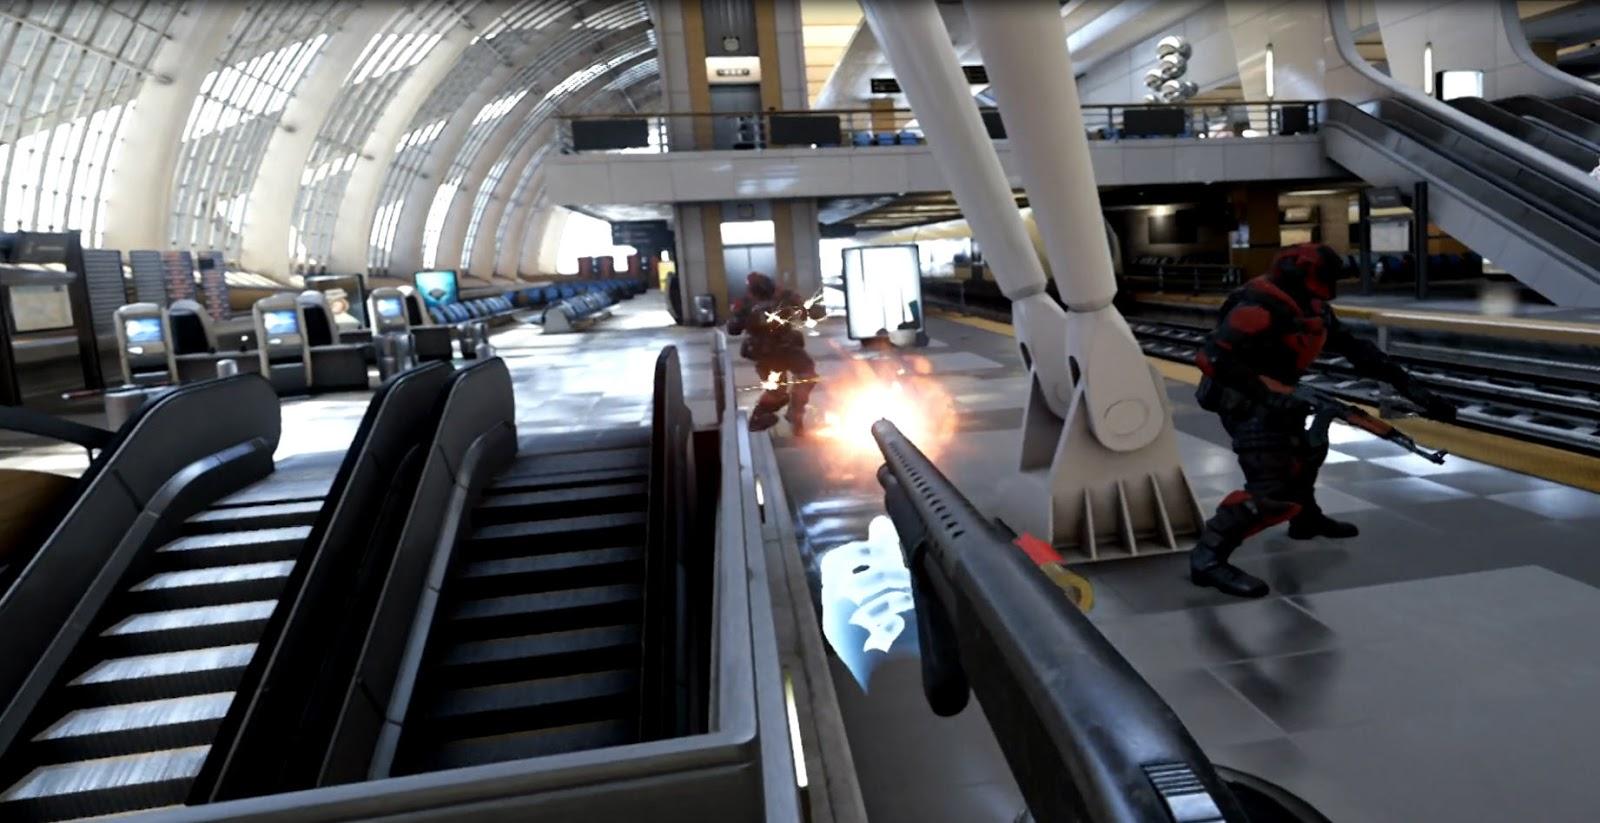 All Aboard The Bullet Train - Epic's VR shoot-em-up